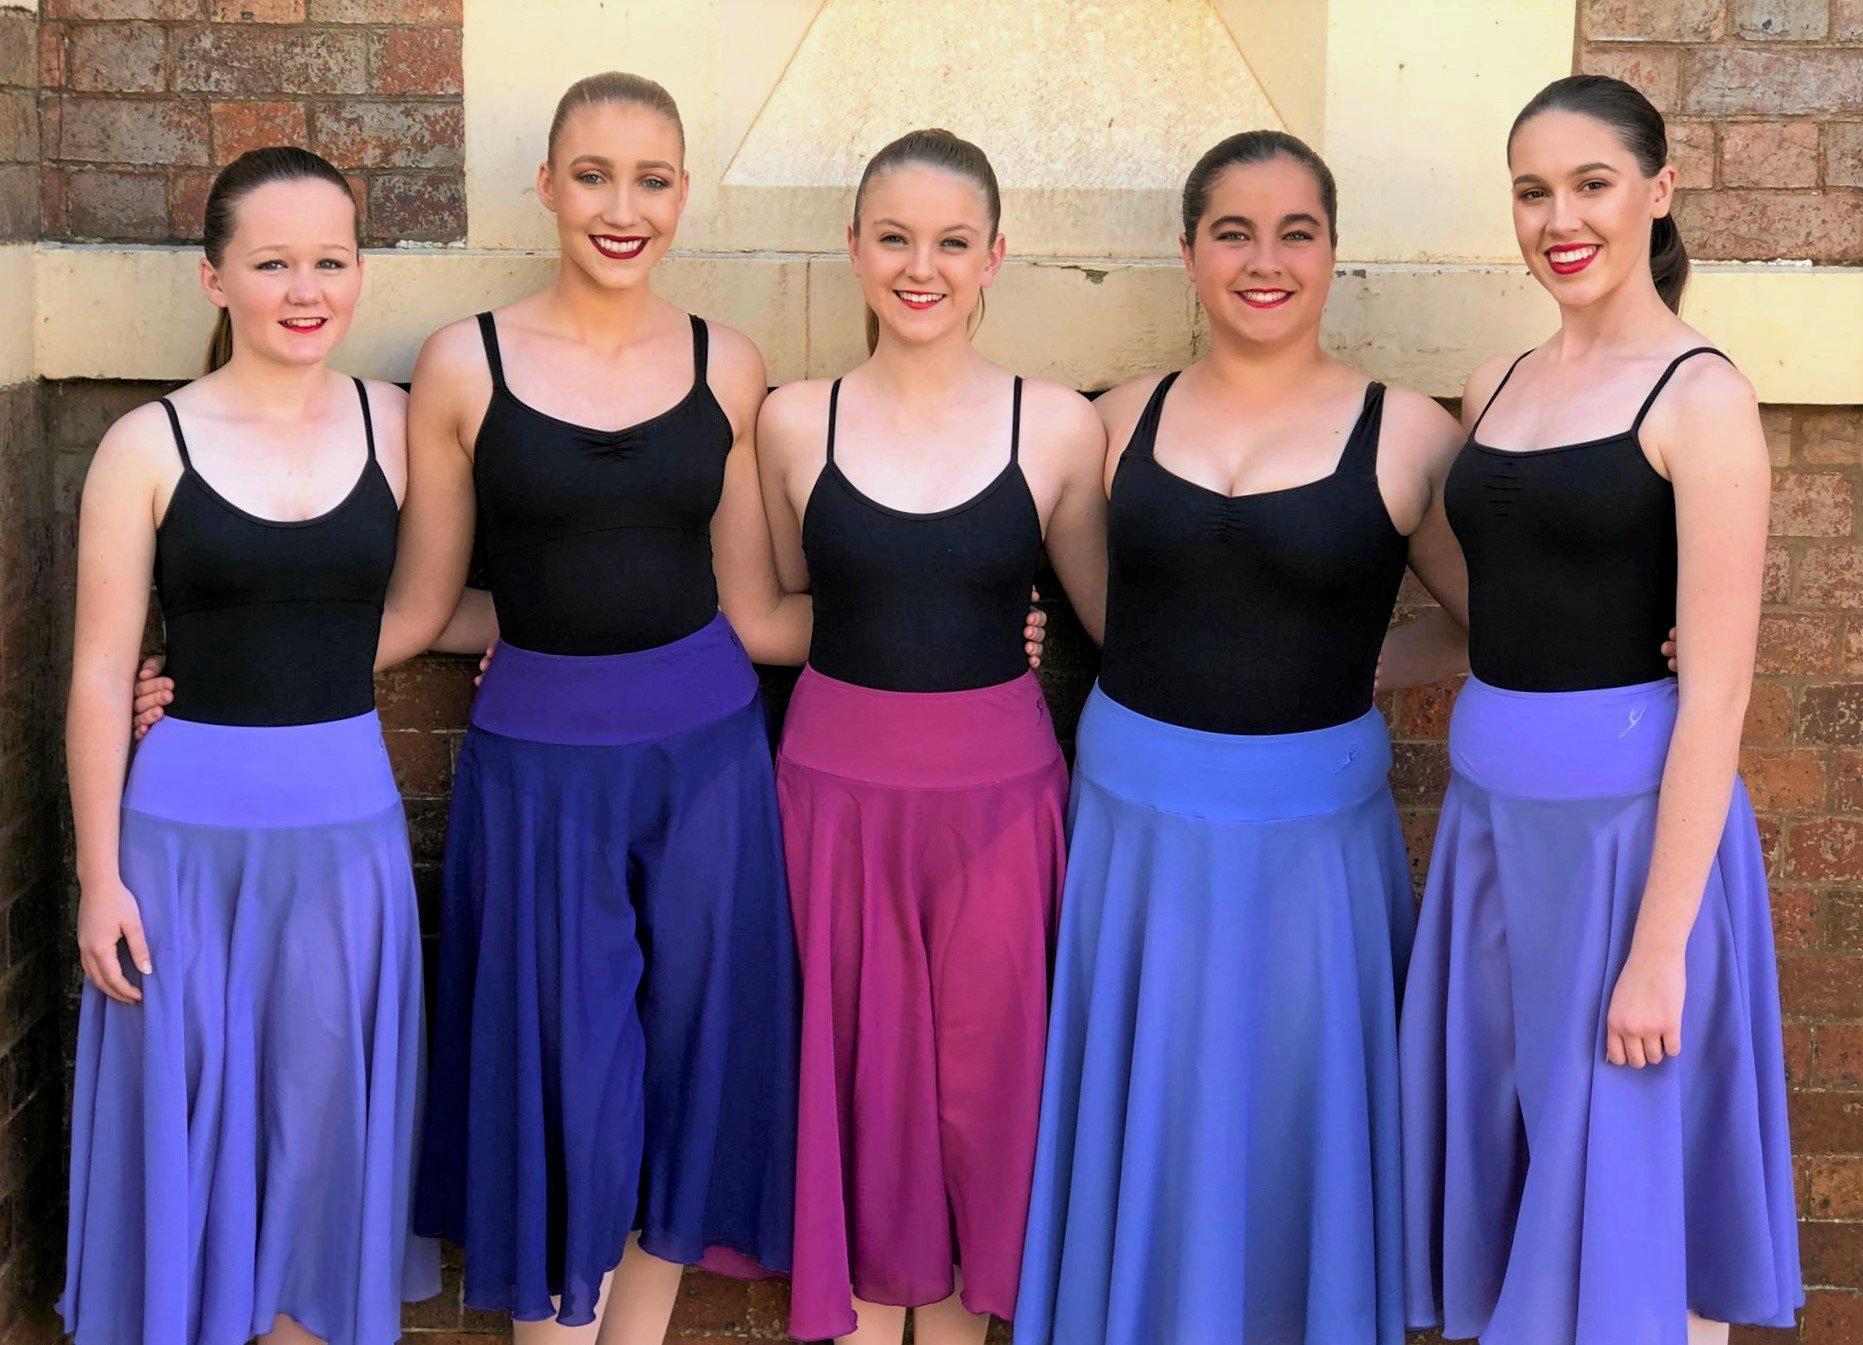 DANCING WITH TOWN PRIDE: Senior dancers, Chloe Honnery, Tawnie Benecke, Skye Gerke, Mikayla Wilson and Lauren Fendley from Chinchilla Dance Studio.